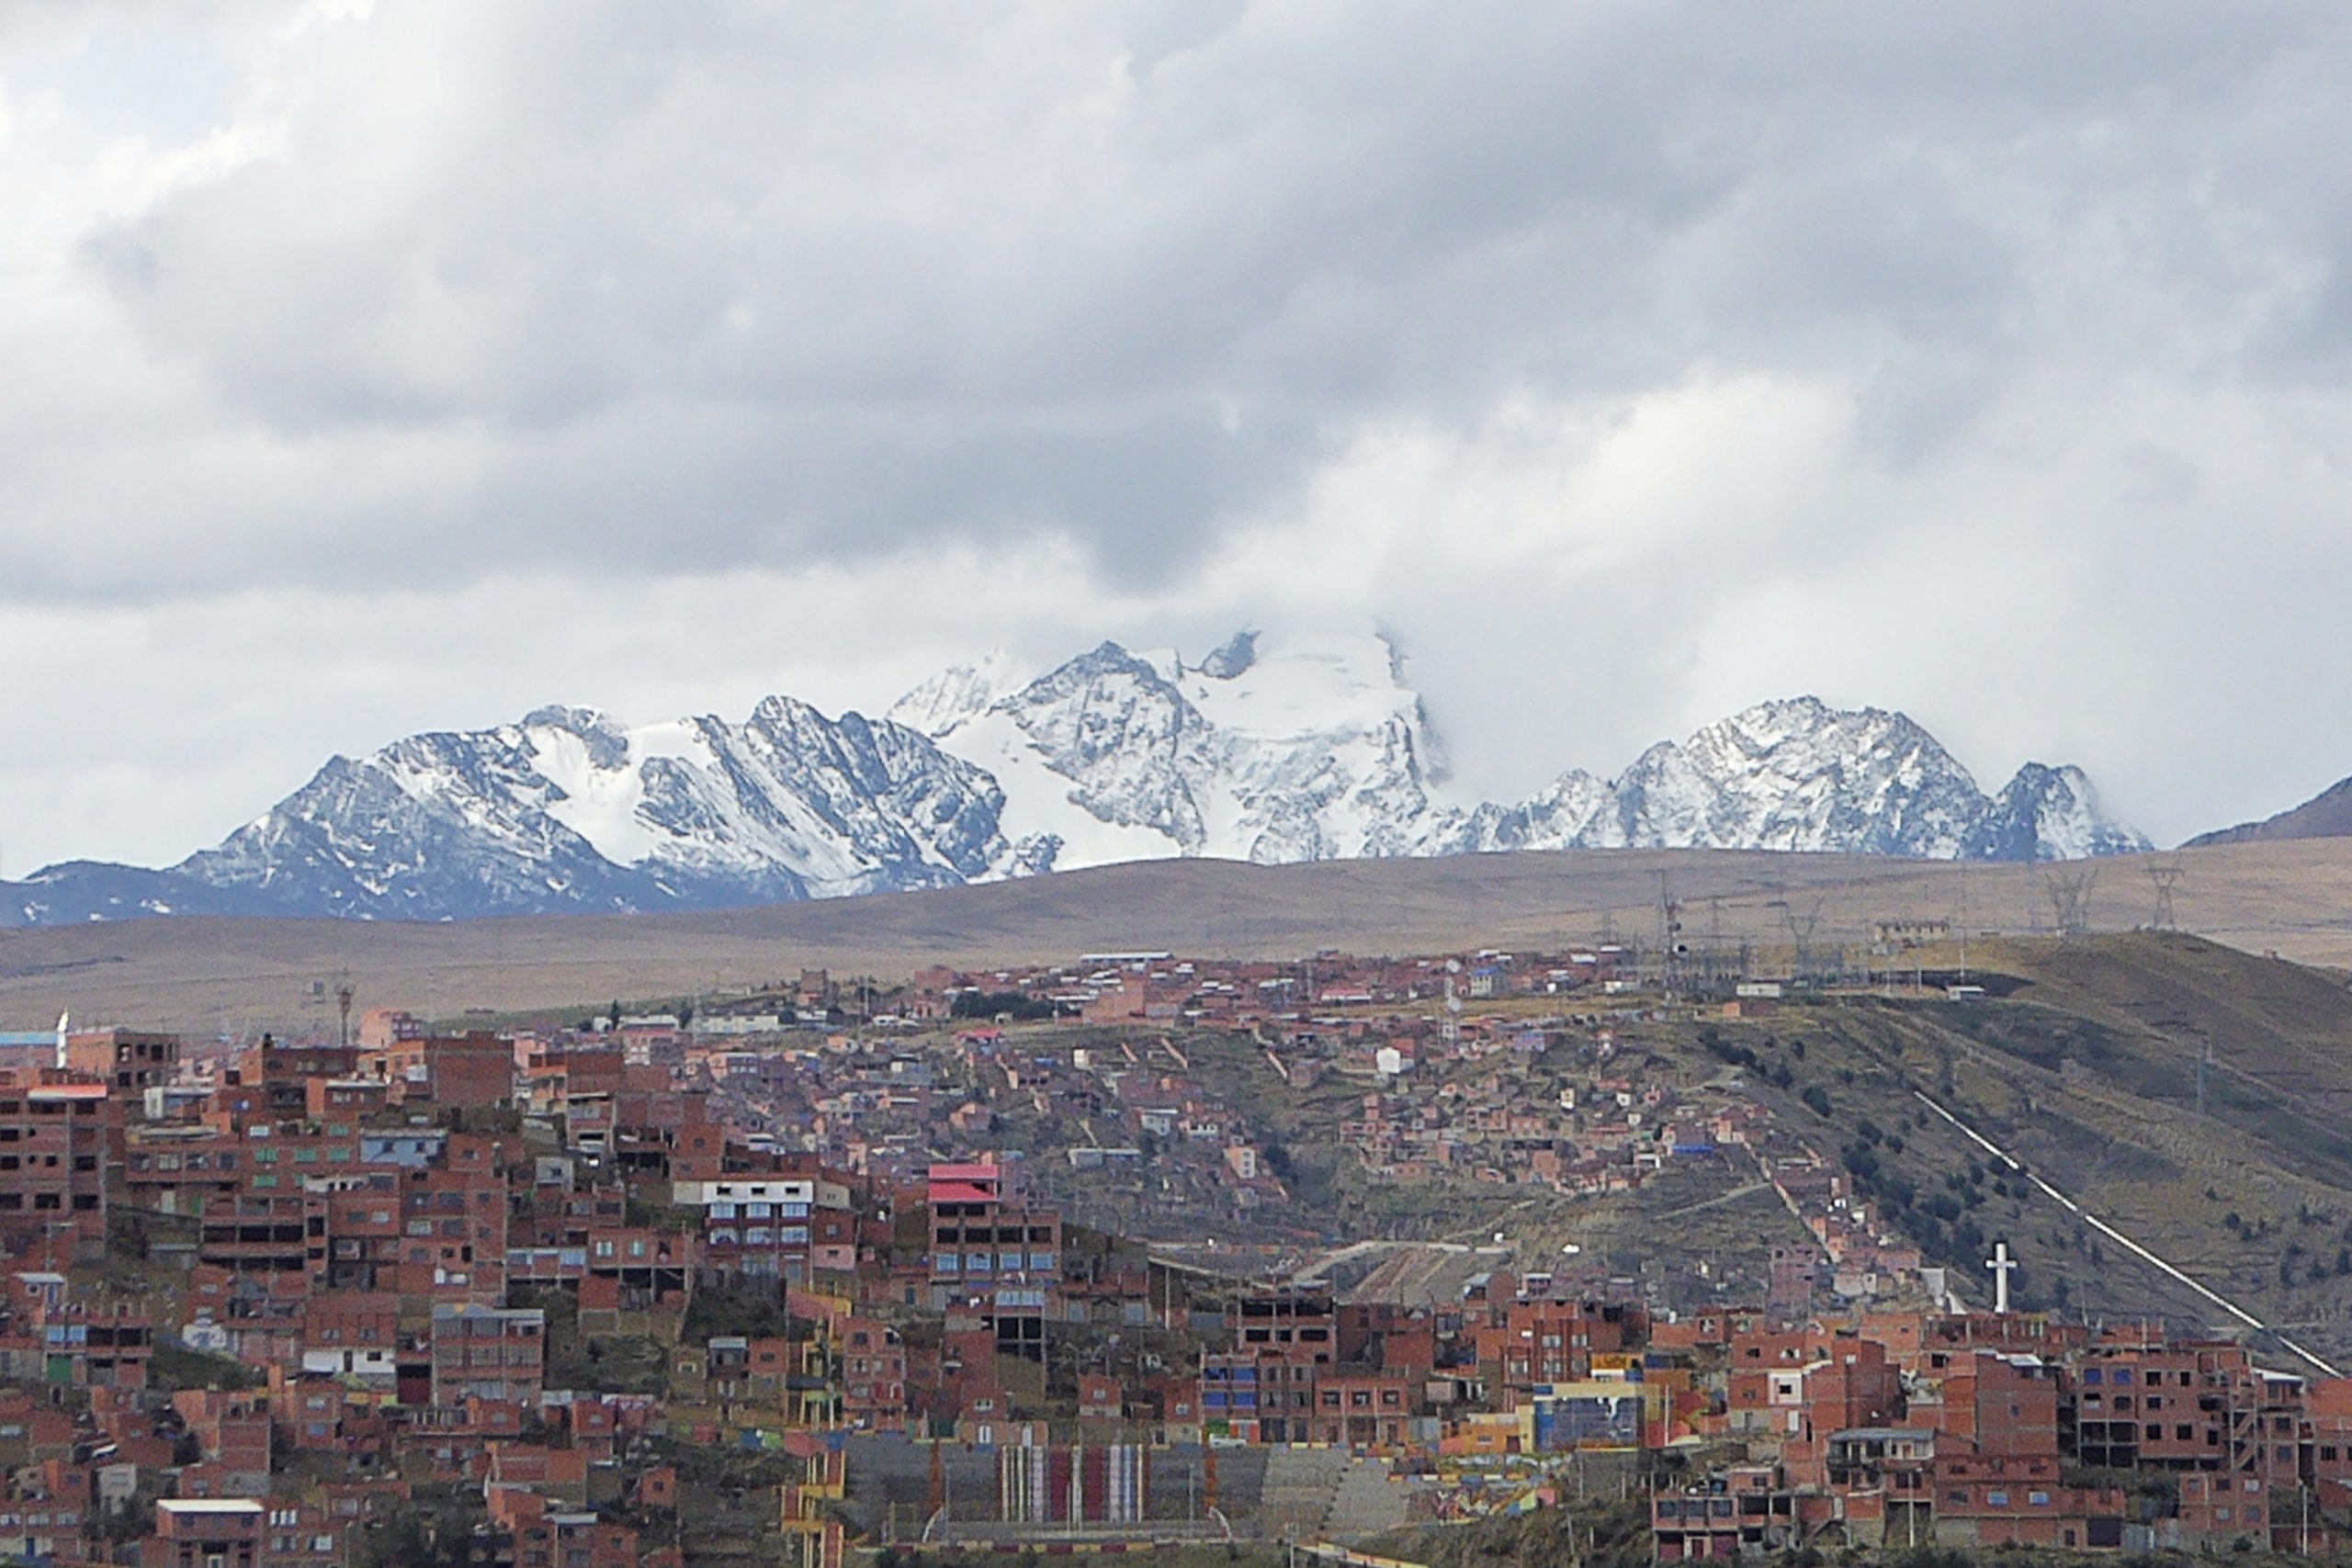 Radreise Südamerika 2019 - Huayna Potosí (6.088m)